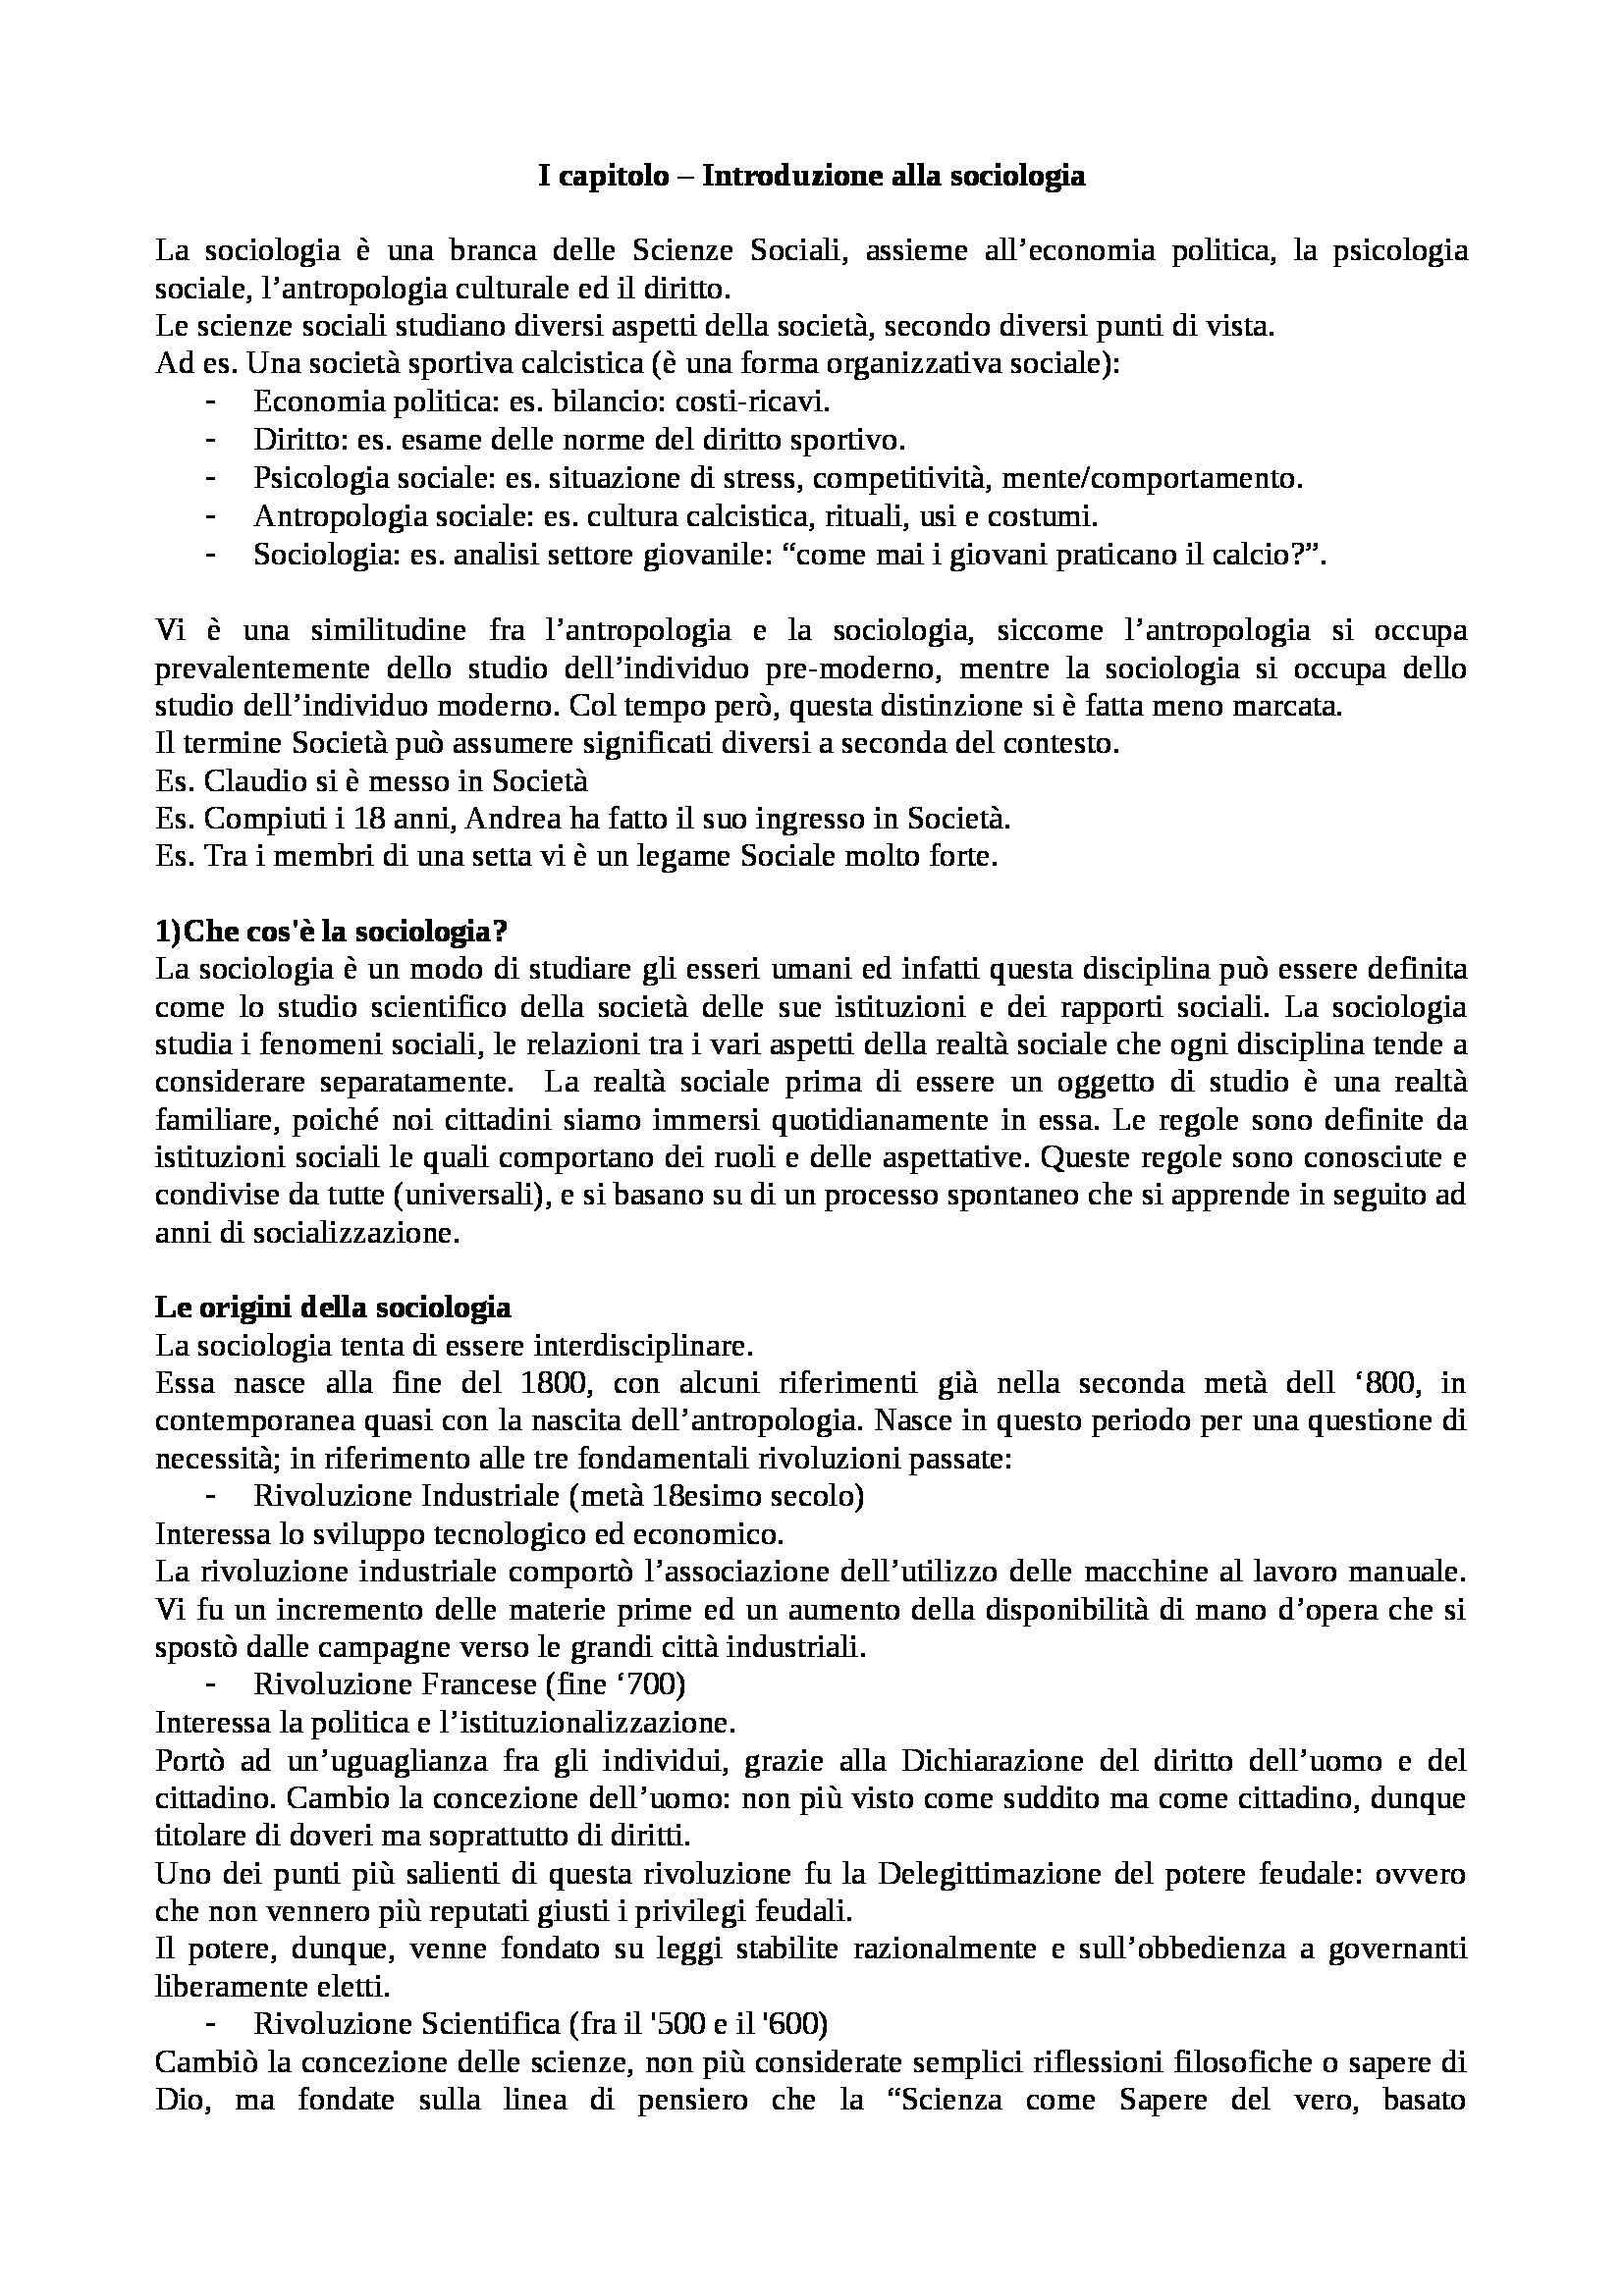 Riassunto esame sociologia, libro adottato Manuale di sociologia, Bologna, Smelser